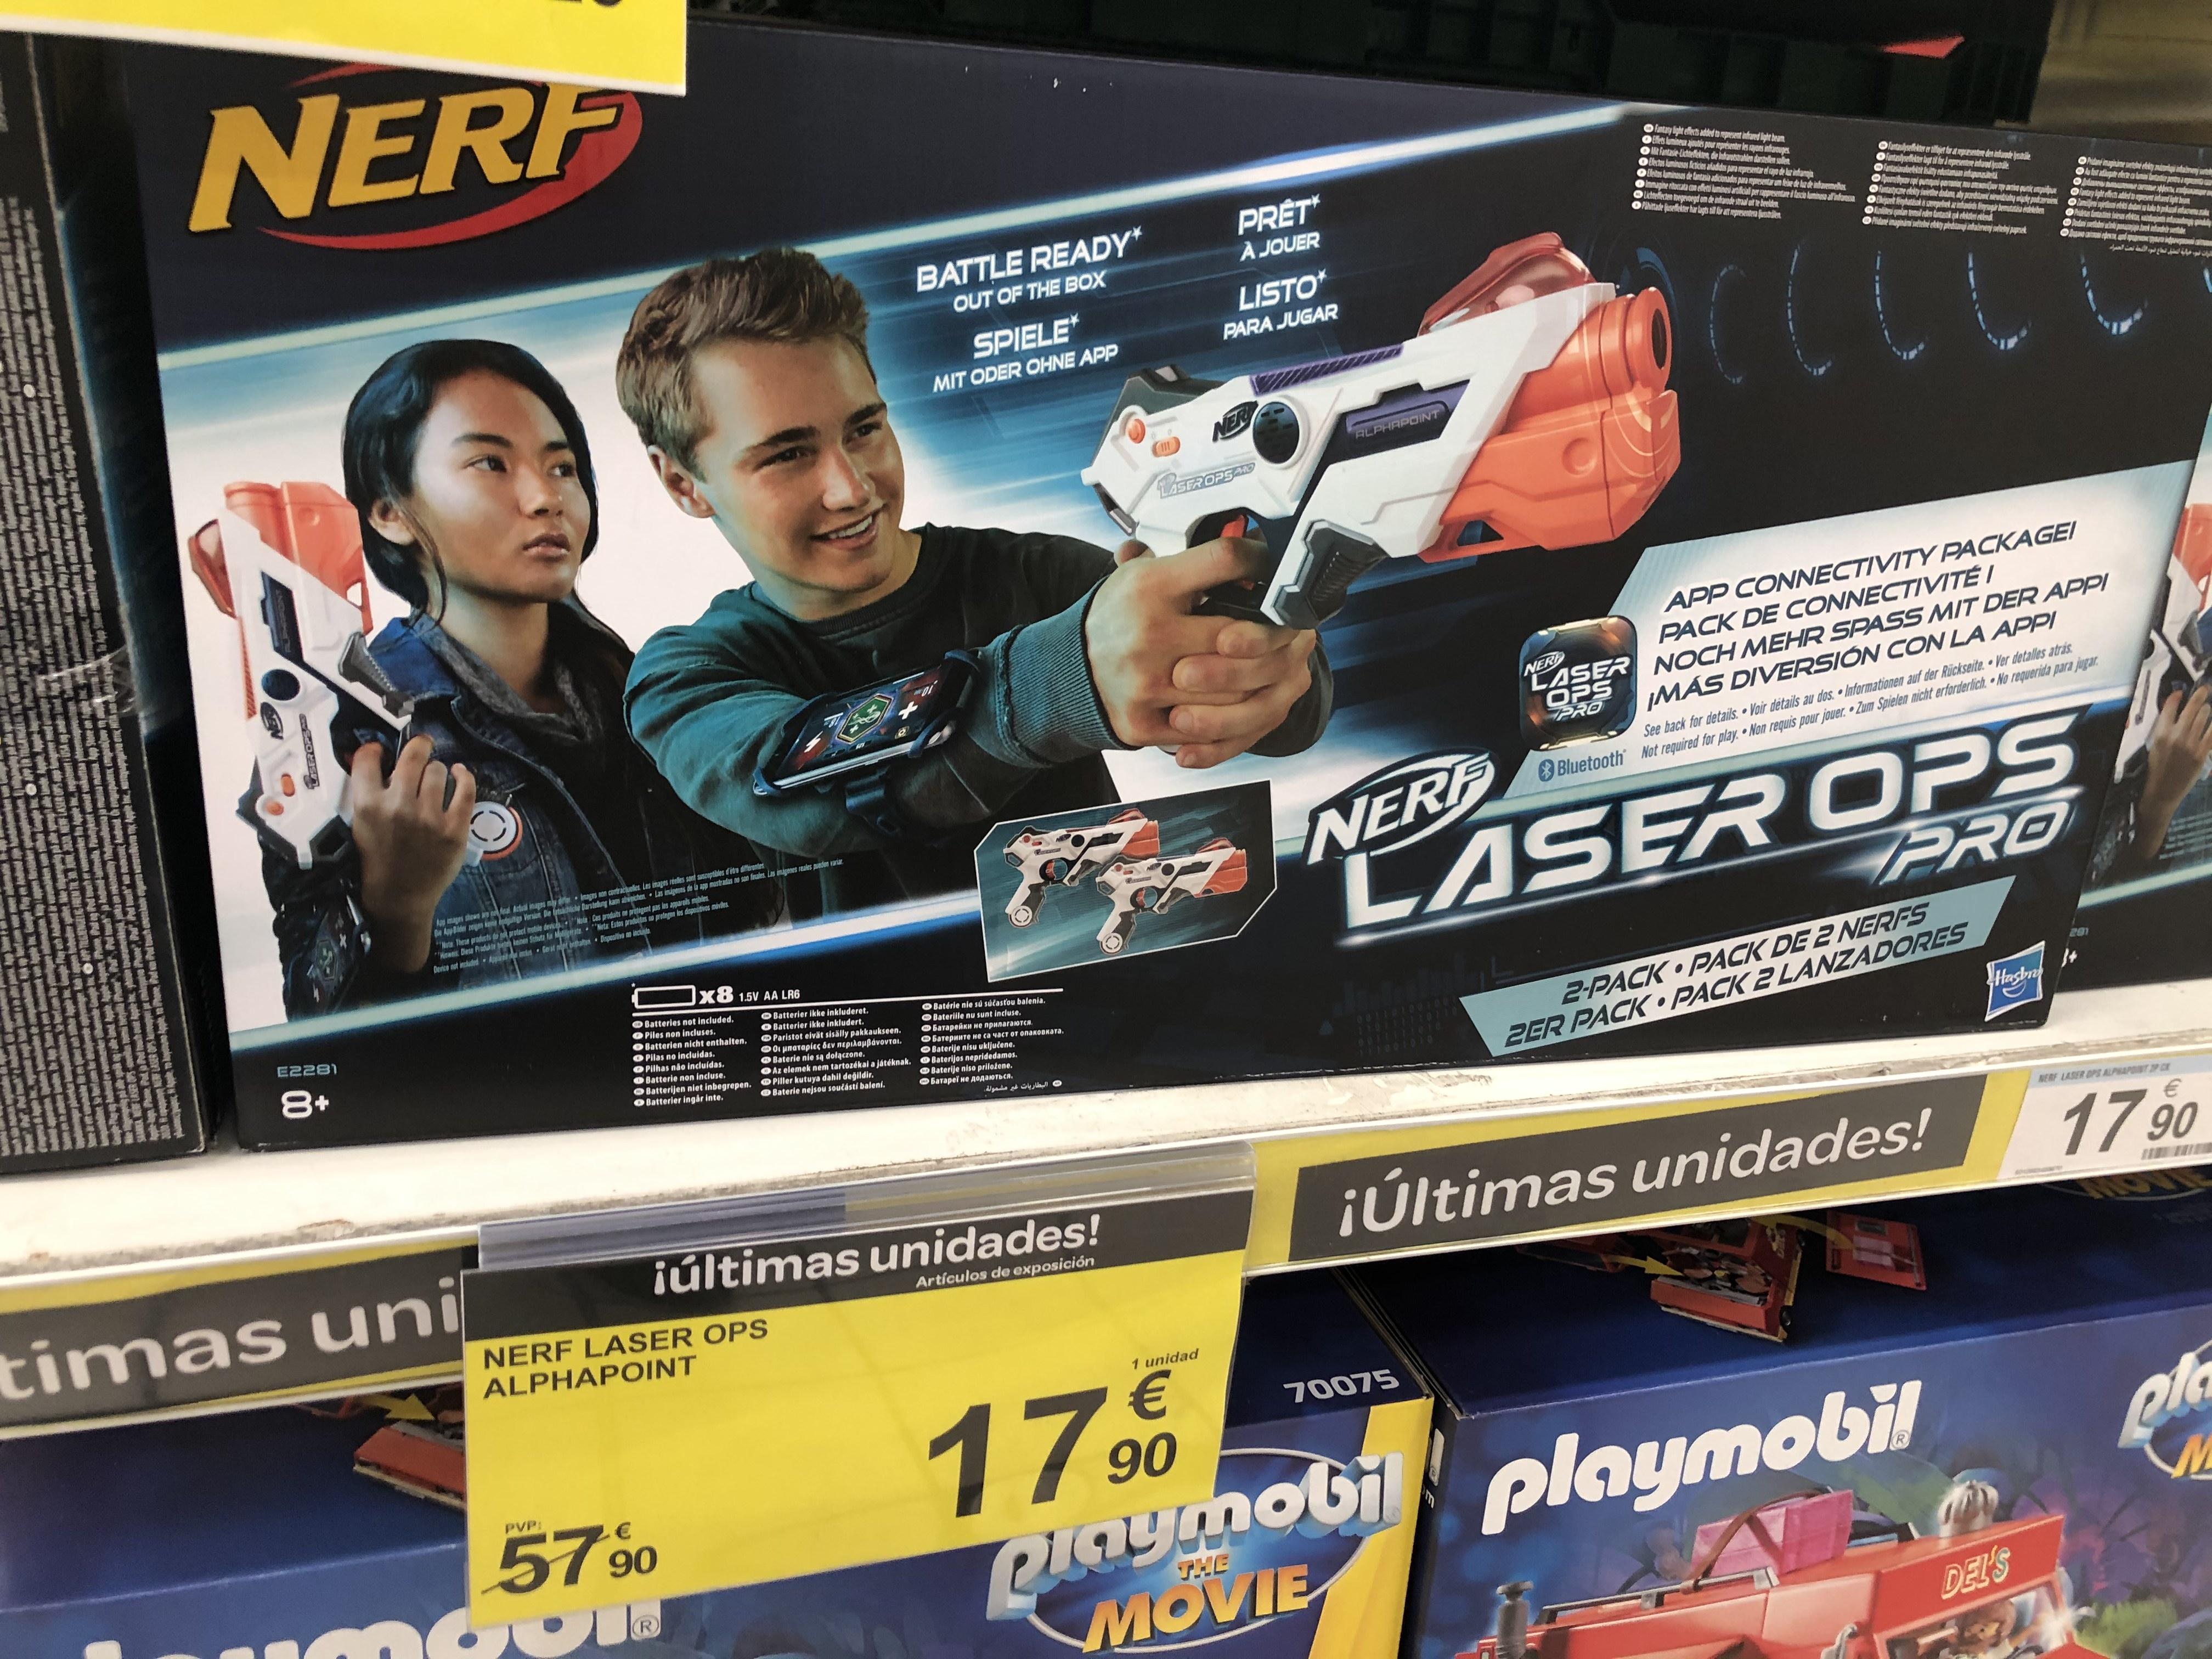 Nerf Laser ops Alphapoint pack de 2 (Ideal para regalo)